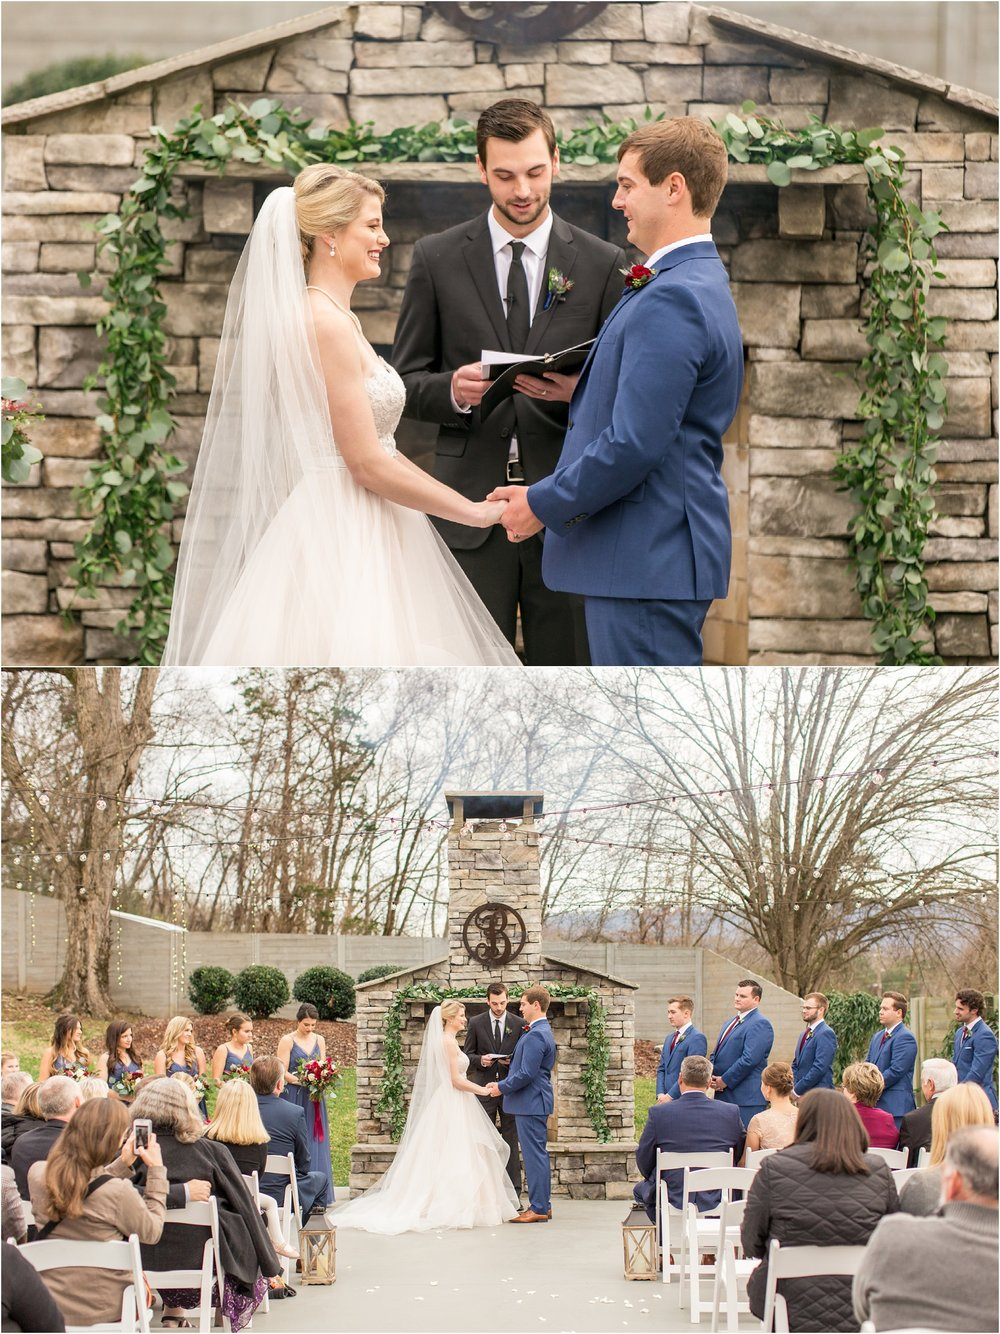 Savannah Eve Photography- Brandon-Brown Wedding-56.jpg